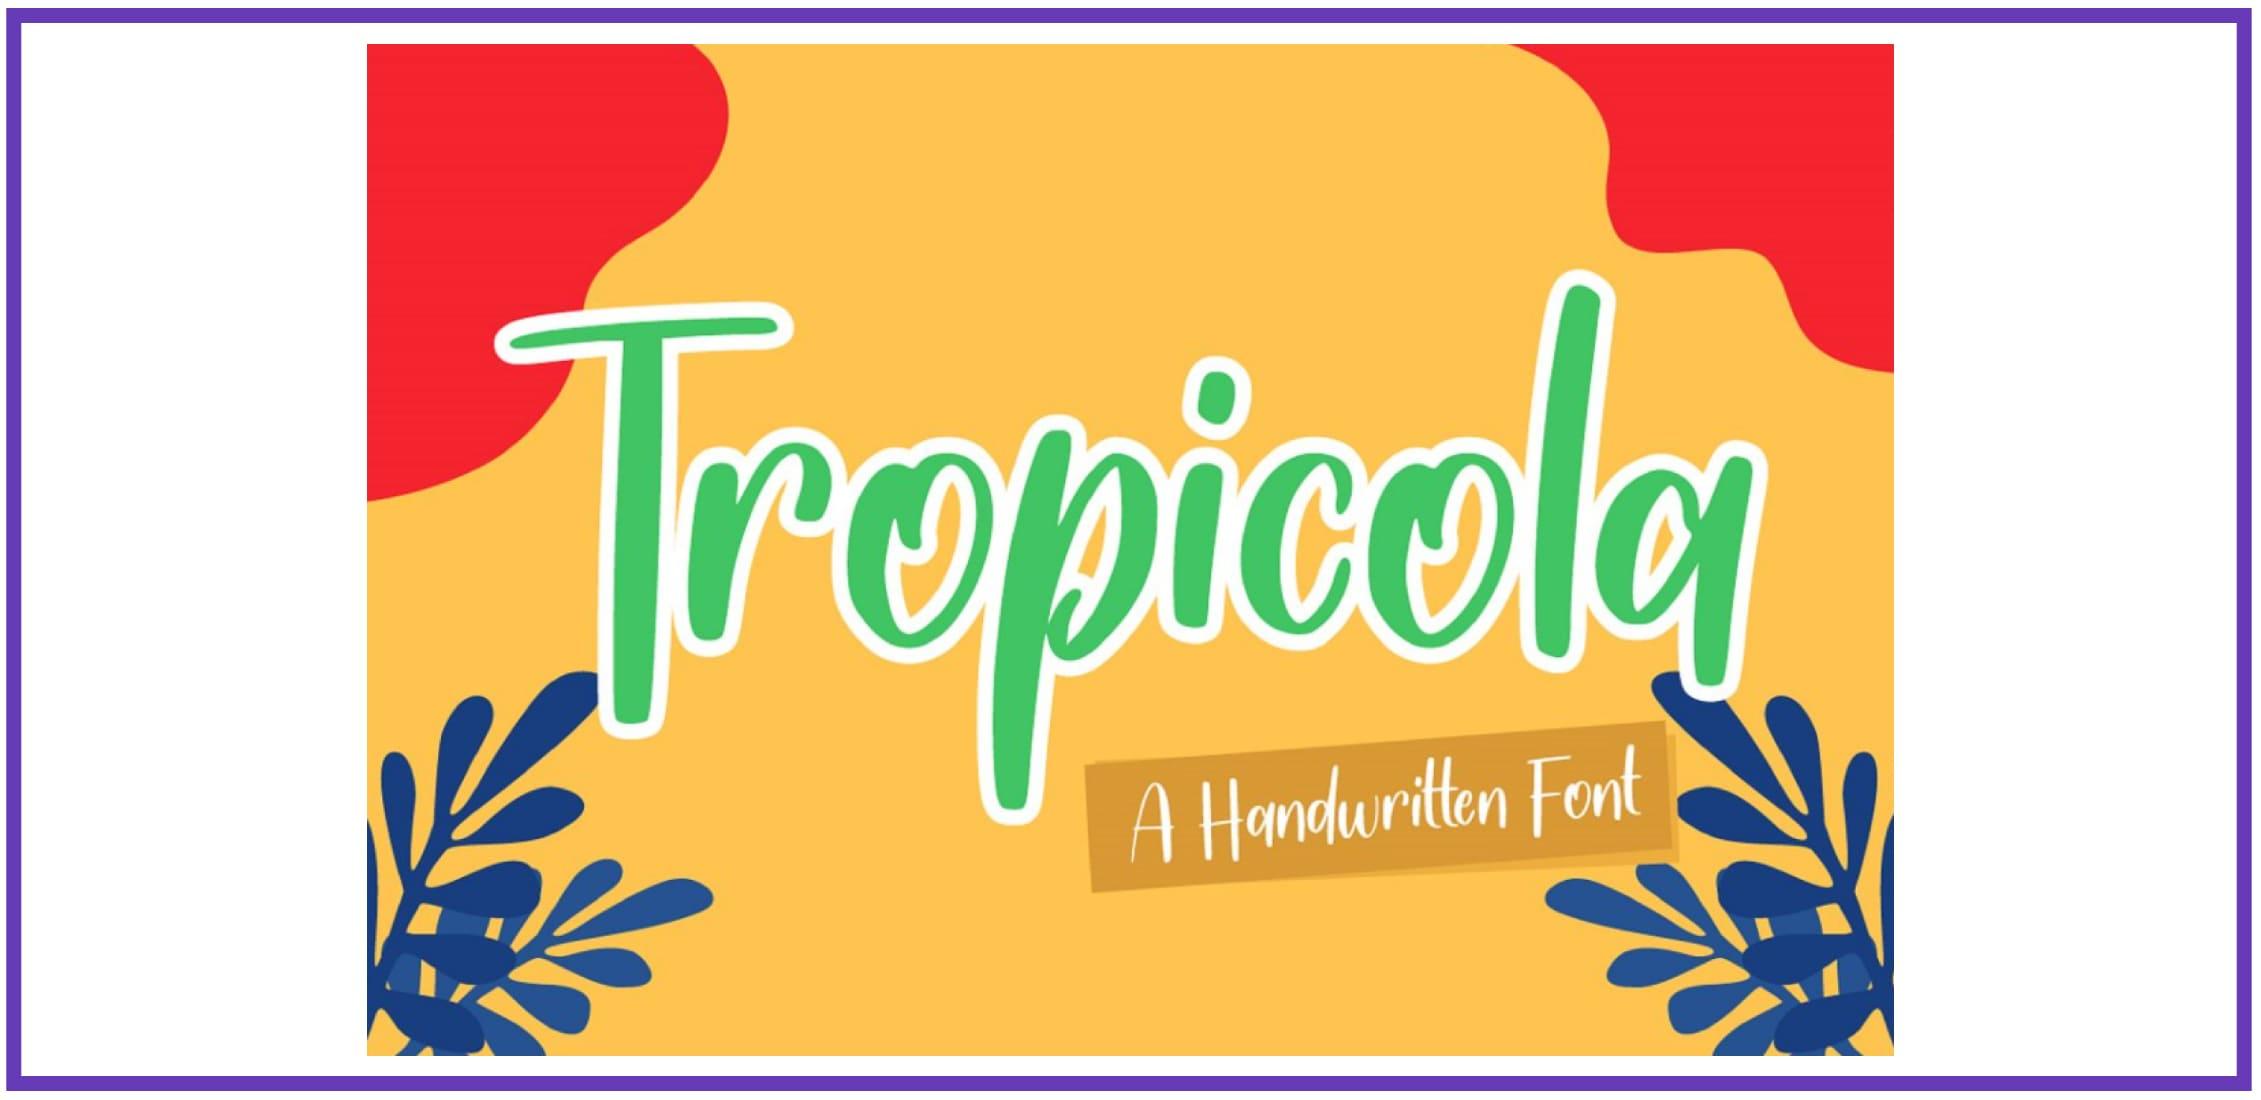 Handwritten Font By Graphue. Tropical Font.